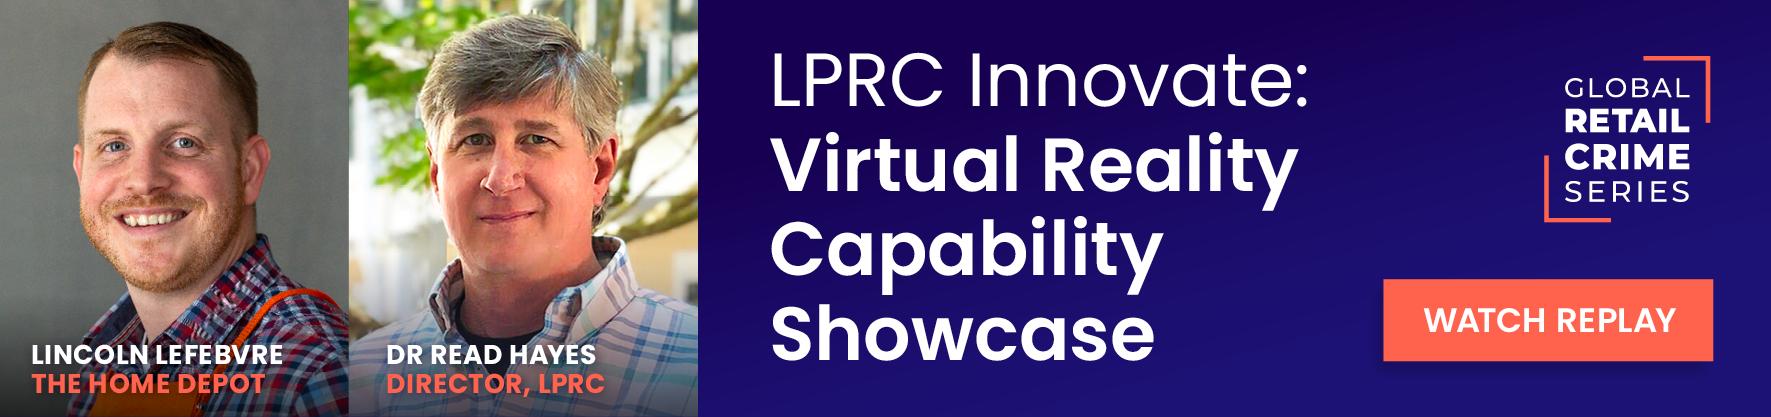 LPRC innovate: Virtual reality capability showcase